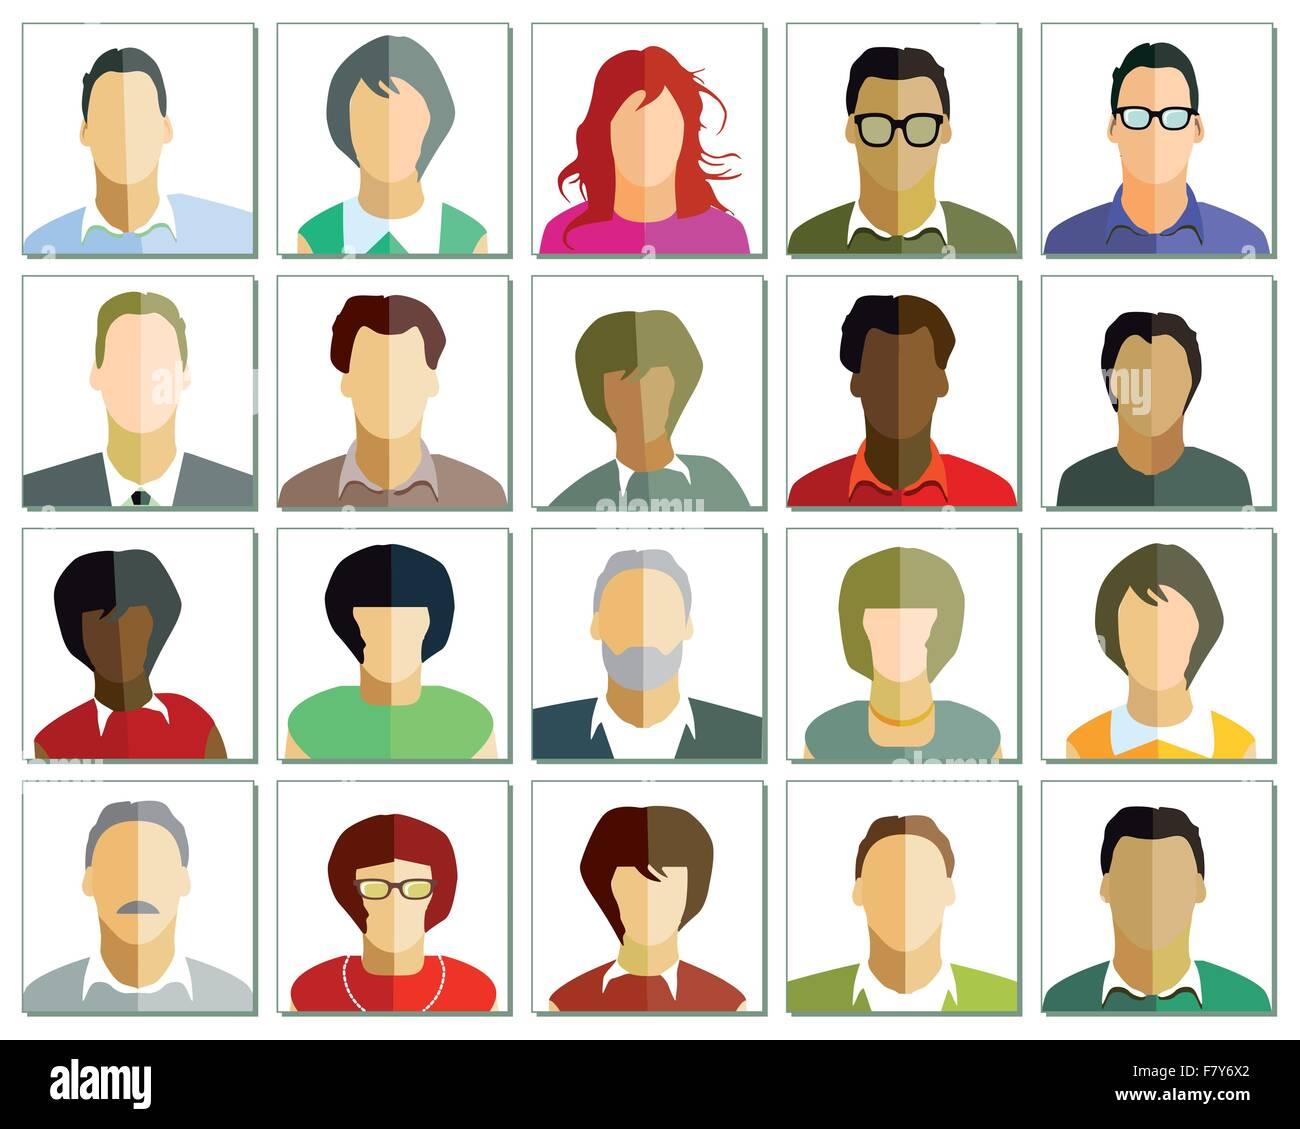 face portrait - Stock Vector